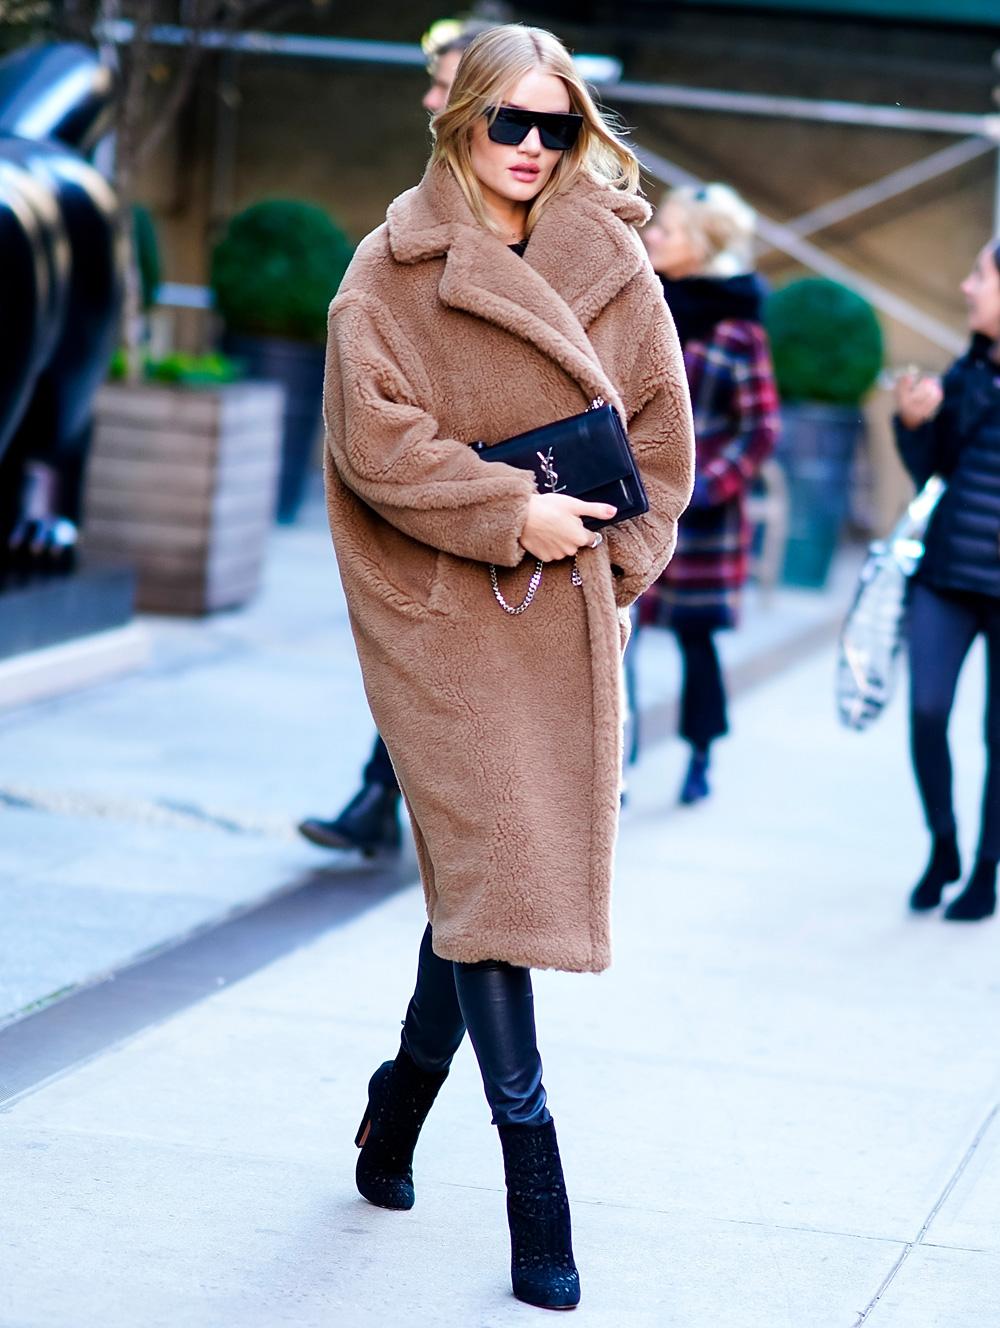 Rosie Huntington-Whiteley Wearing a Max Mara Teddybear ...